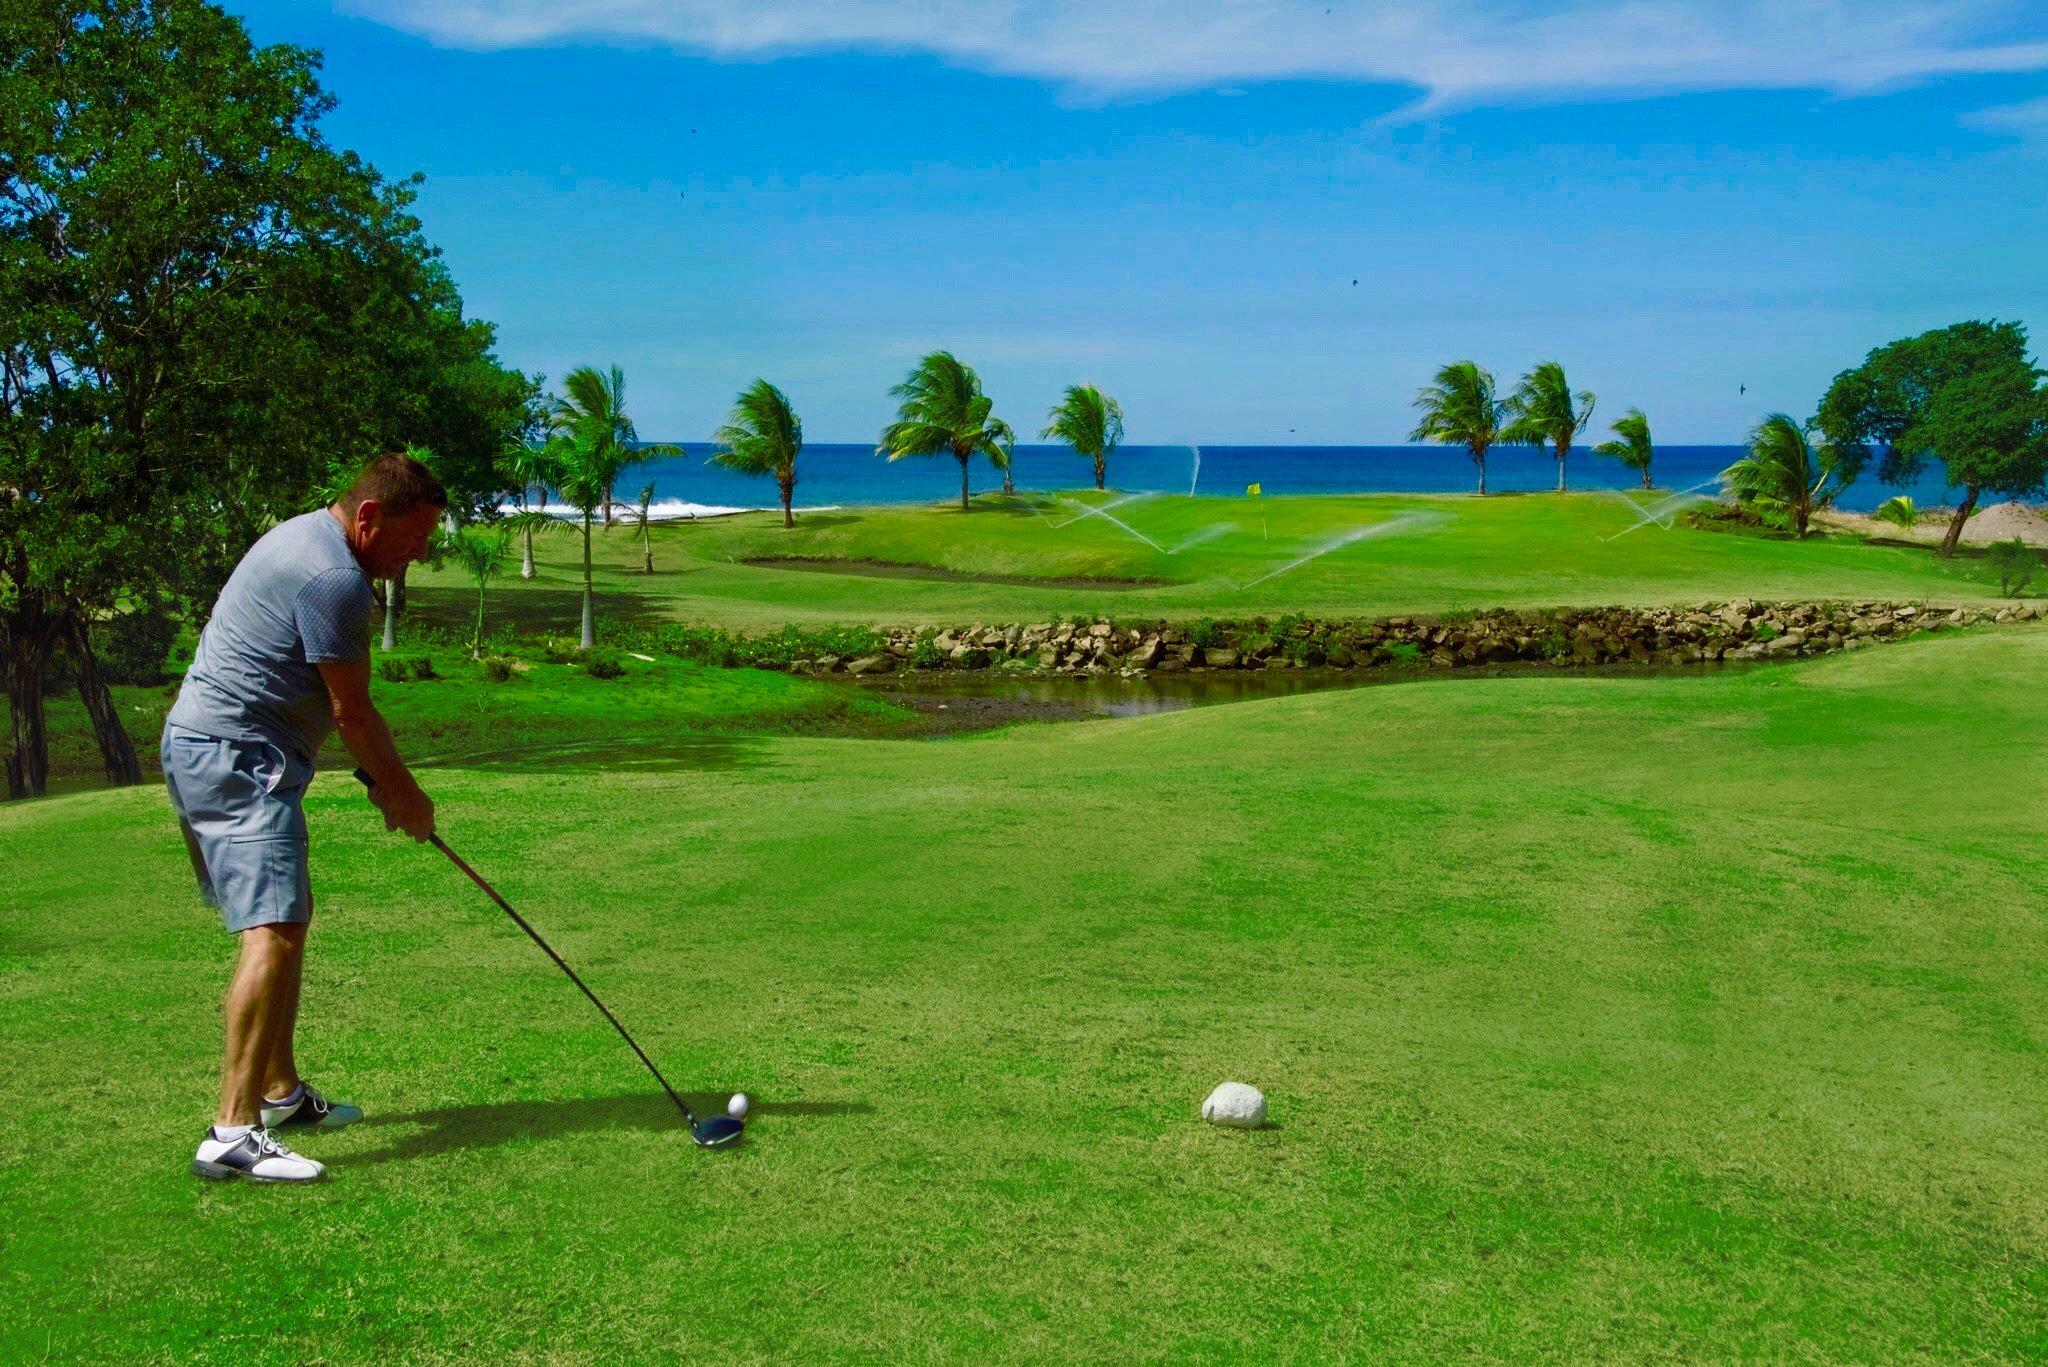 GP_-_Golf_Course_Golfer